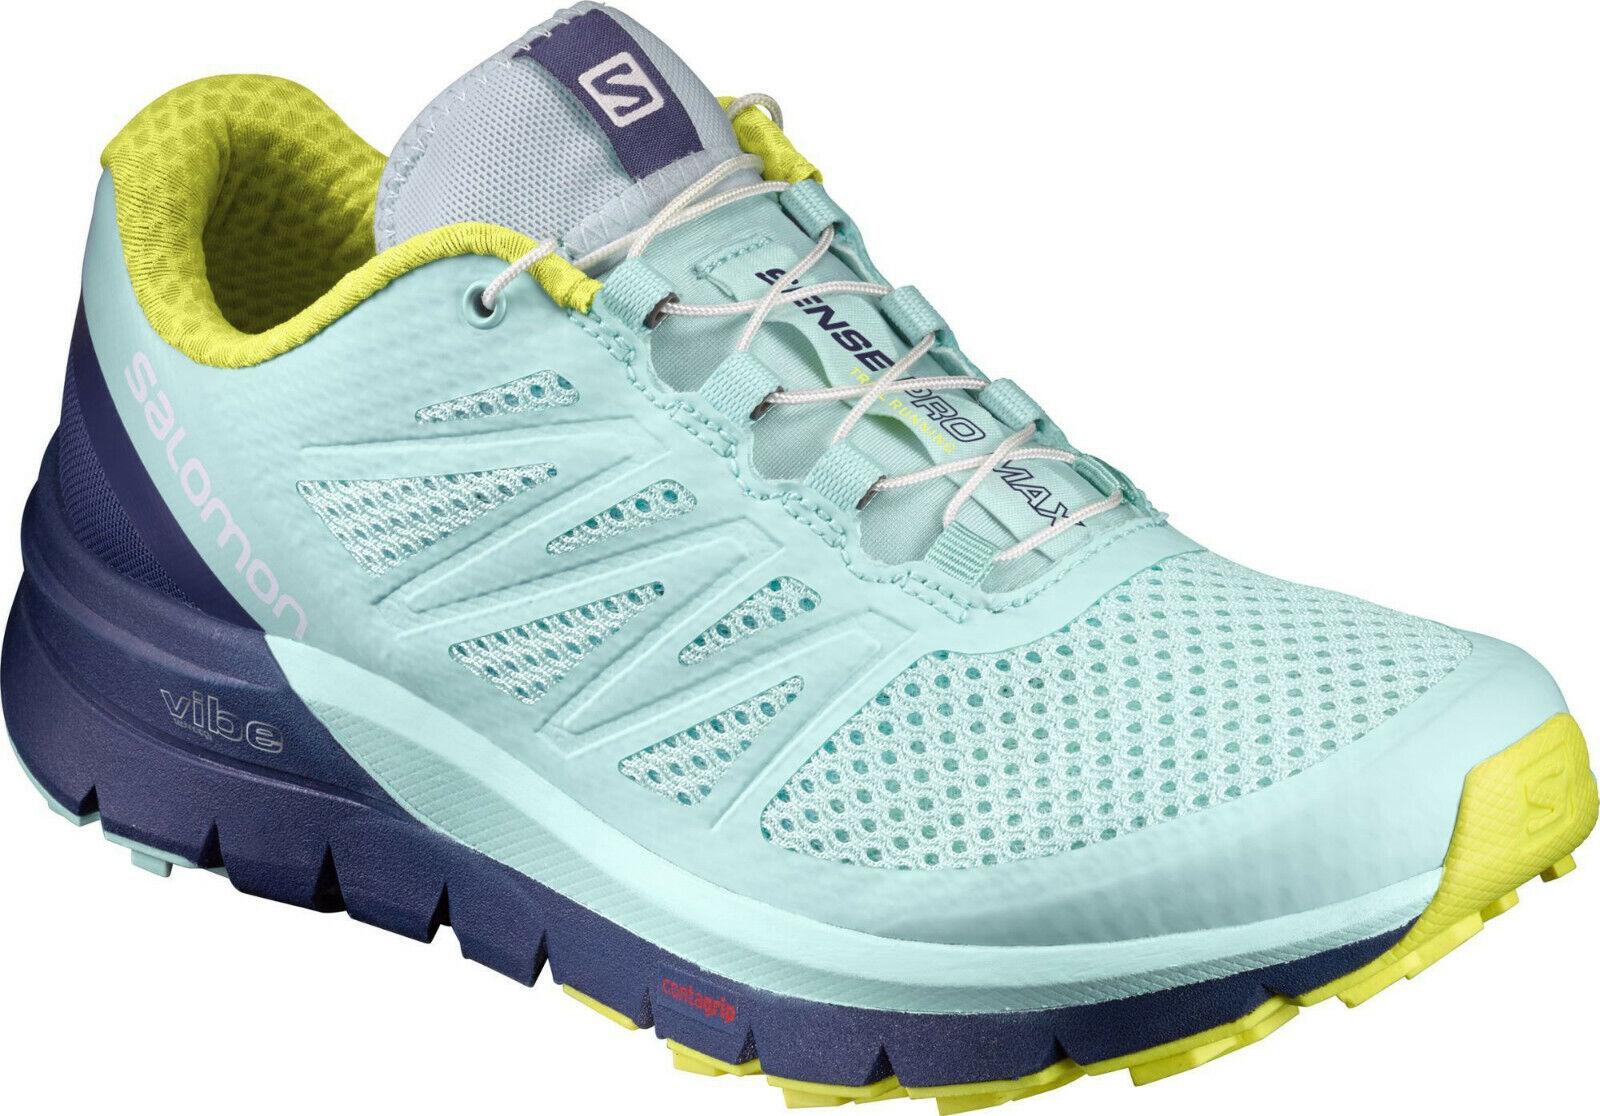 Salomon Sense Pro Max 3D Malla Trail Running Zapatos Zapatillas De Mujer Talla 11 halfzapatos